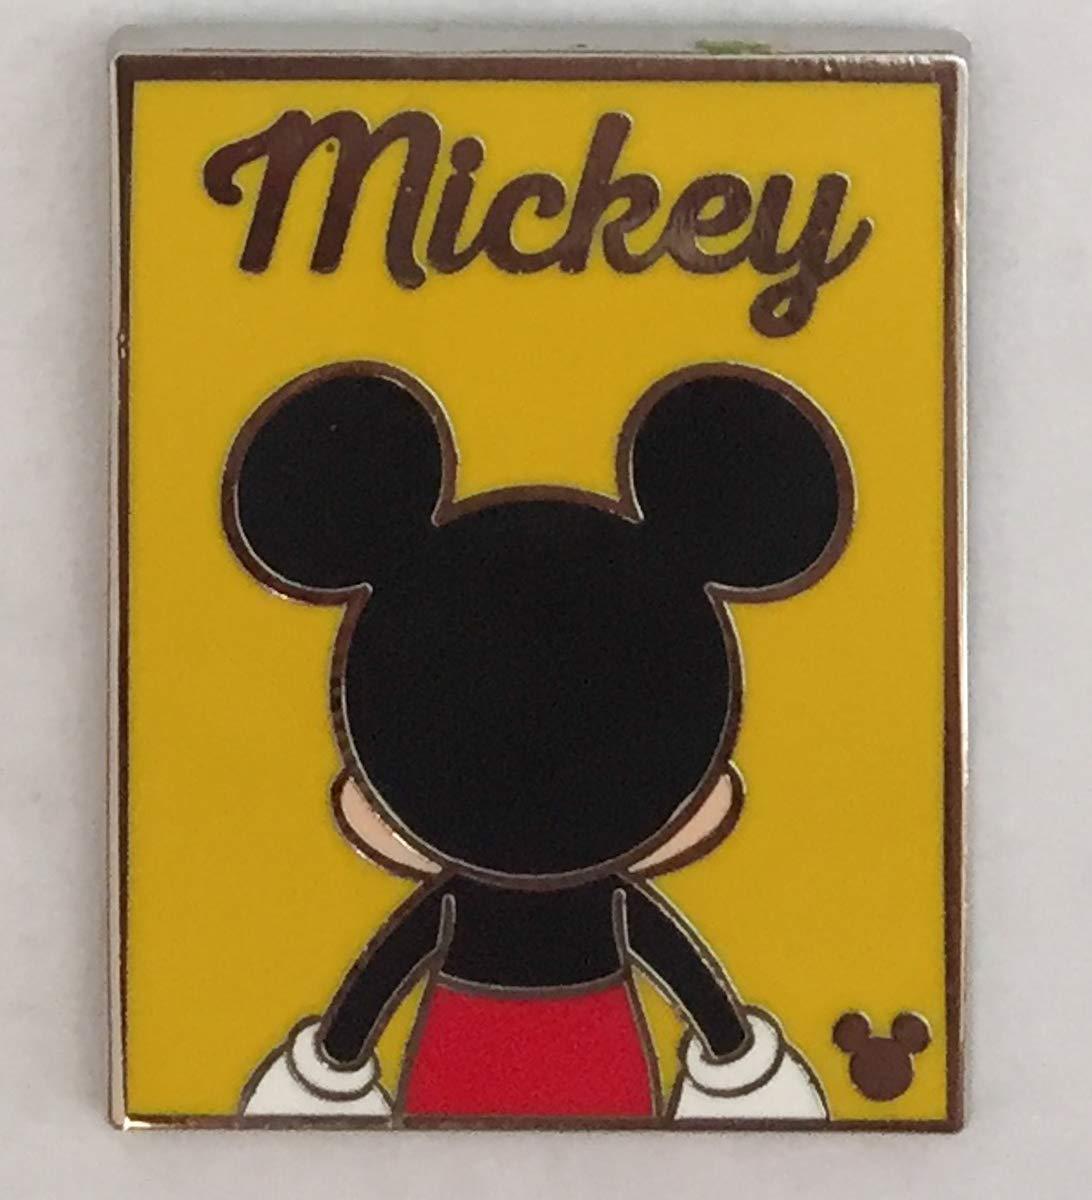 Disney Pin DLR - Hidden Mickey 2018 - Got Your Back - Mickey Mouse Disney Pin